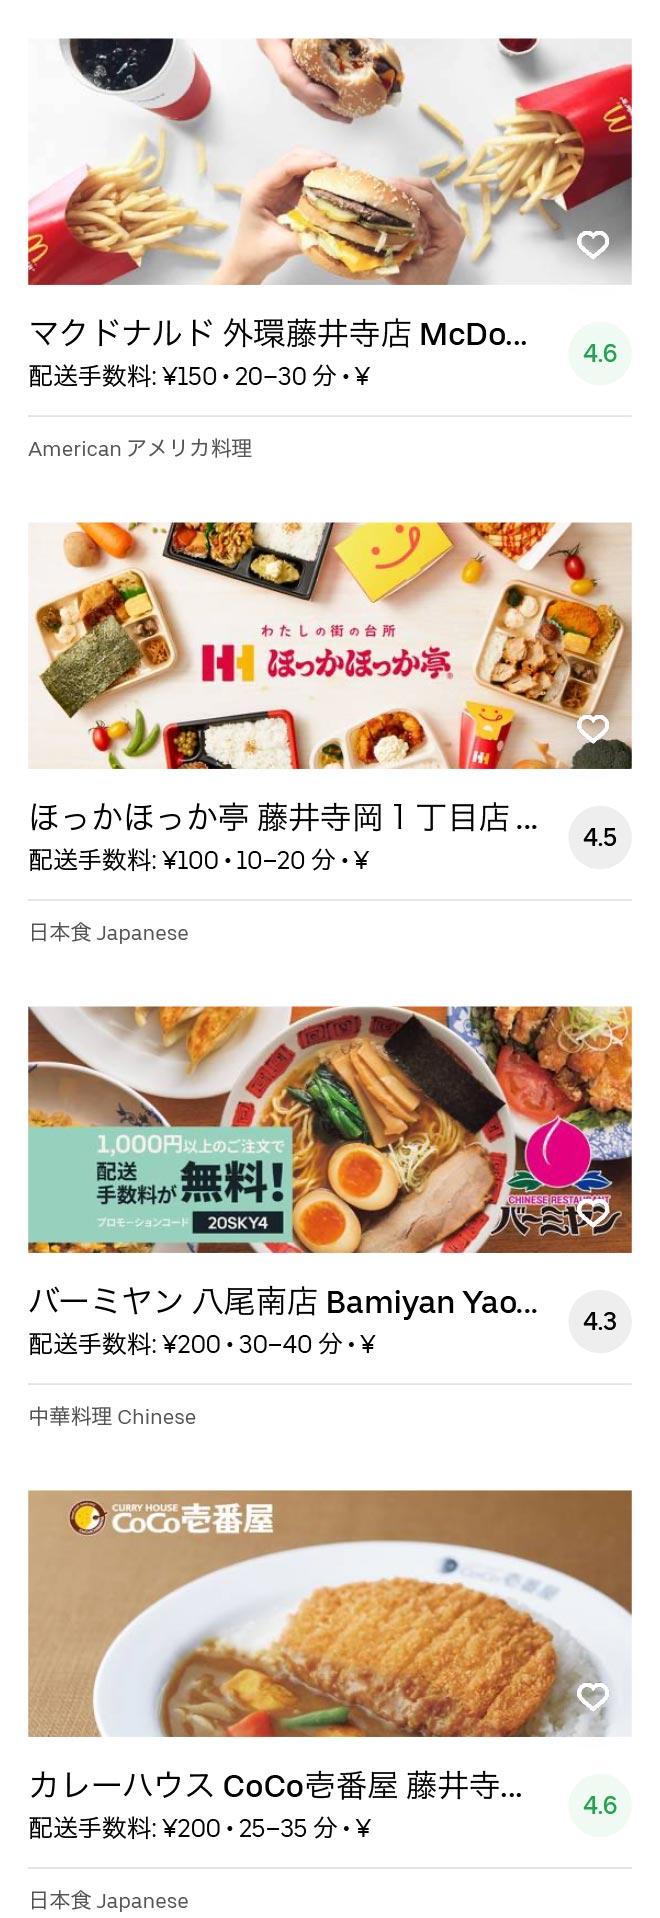 Fujiidera menu 2005 02